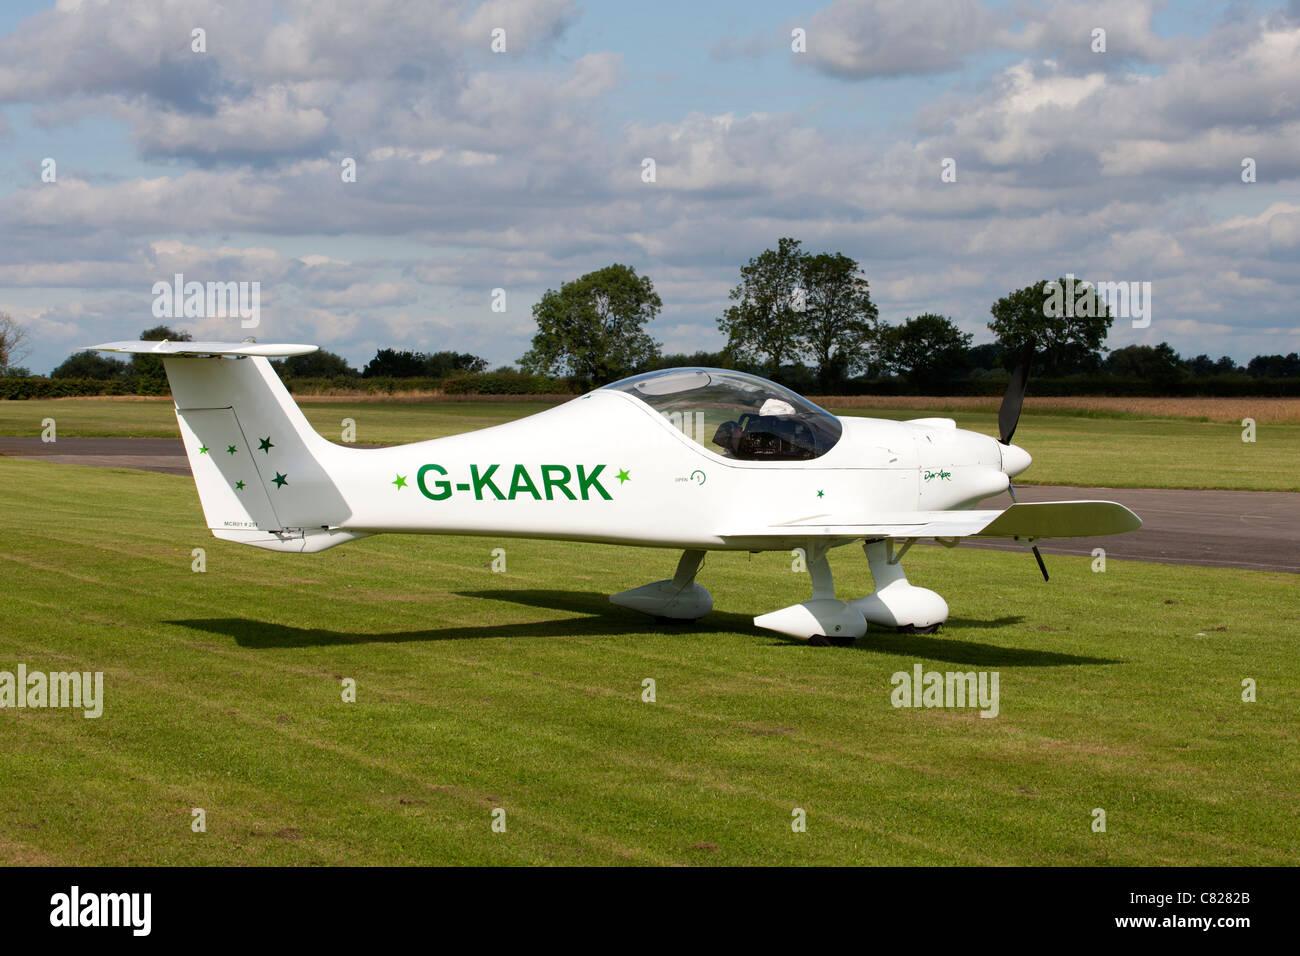 DynAero MCR-01 Club G-KARK parked at Breighton Airfield - Stock Image